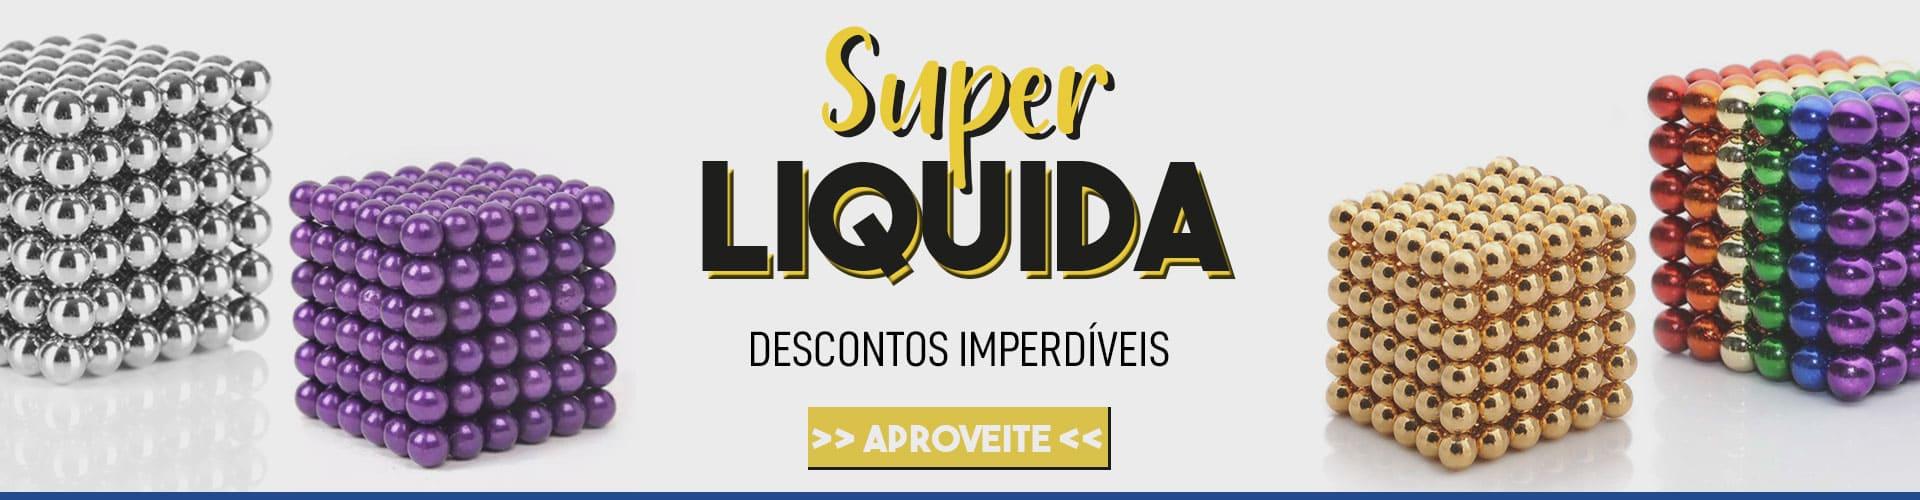 banner principal - Neocube